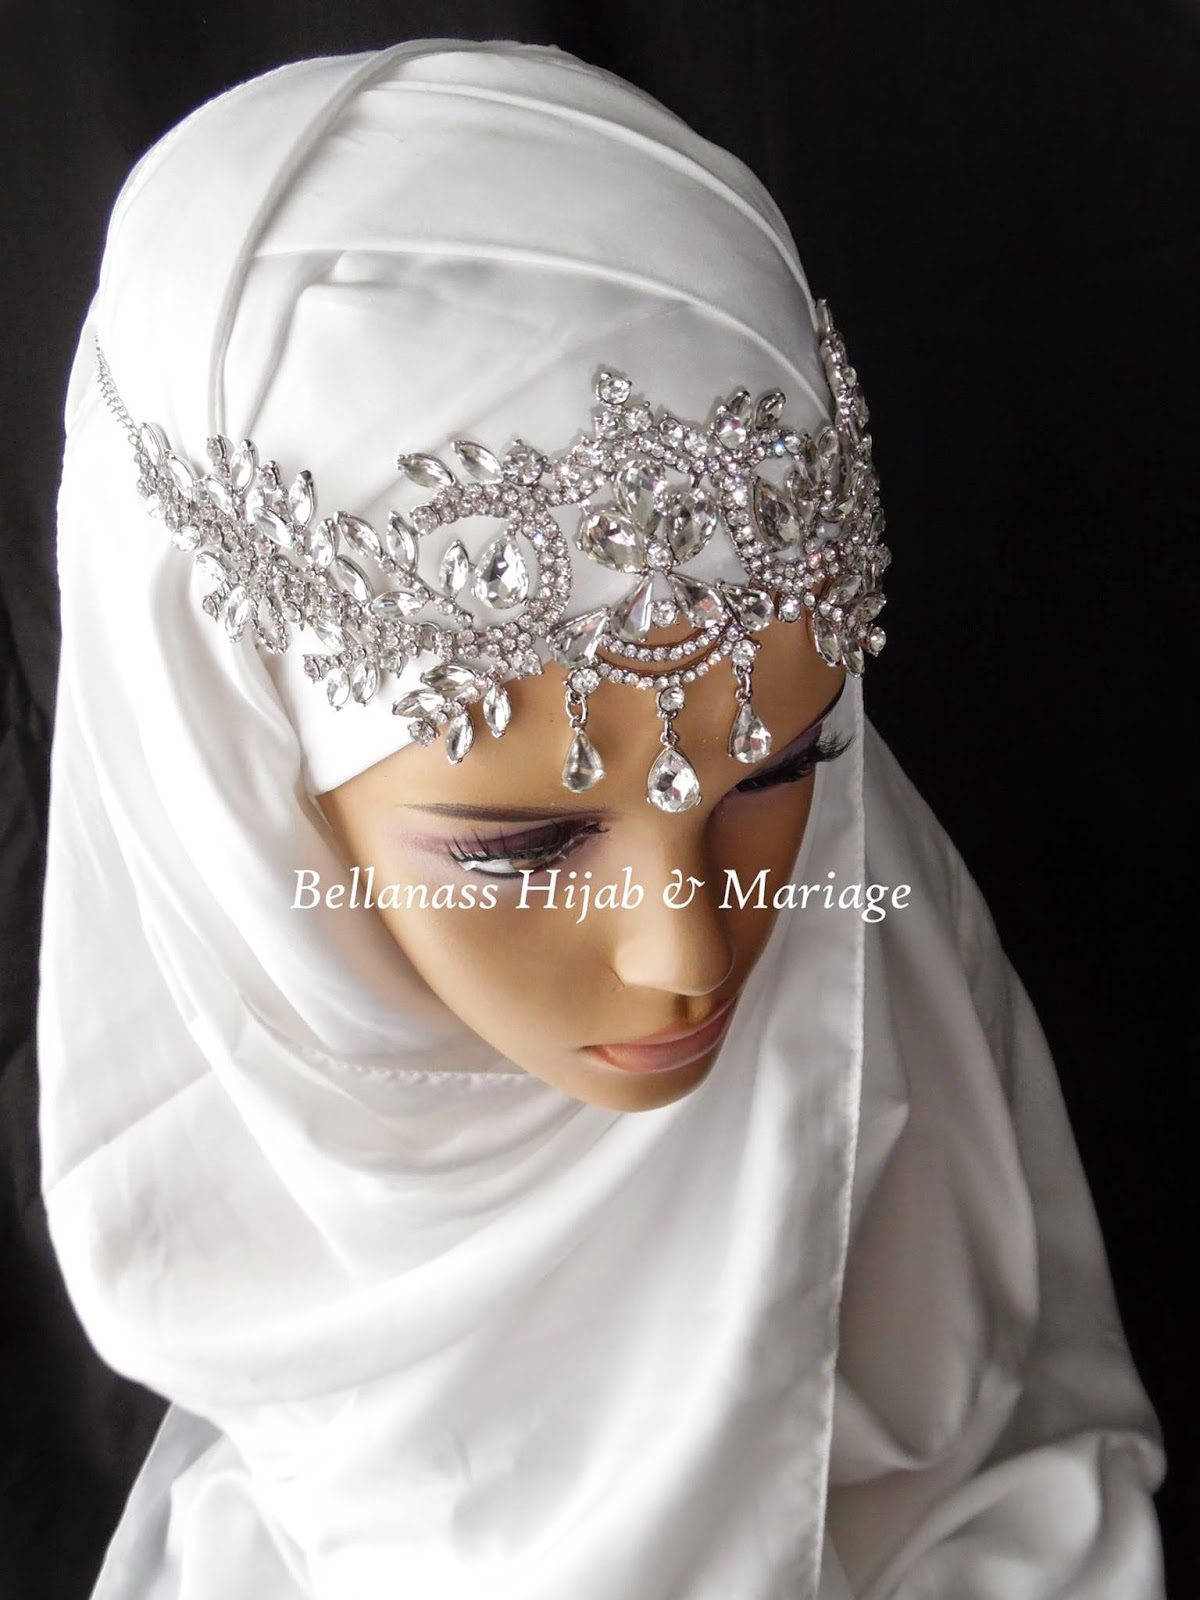 bijoux de tete hijab. Black Bedroom Furniture Sets. Home Design Ideas